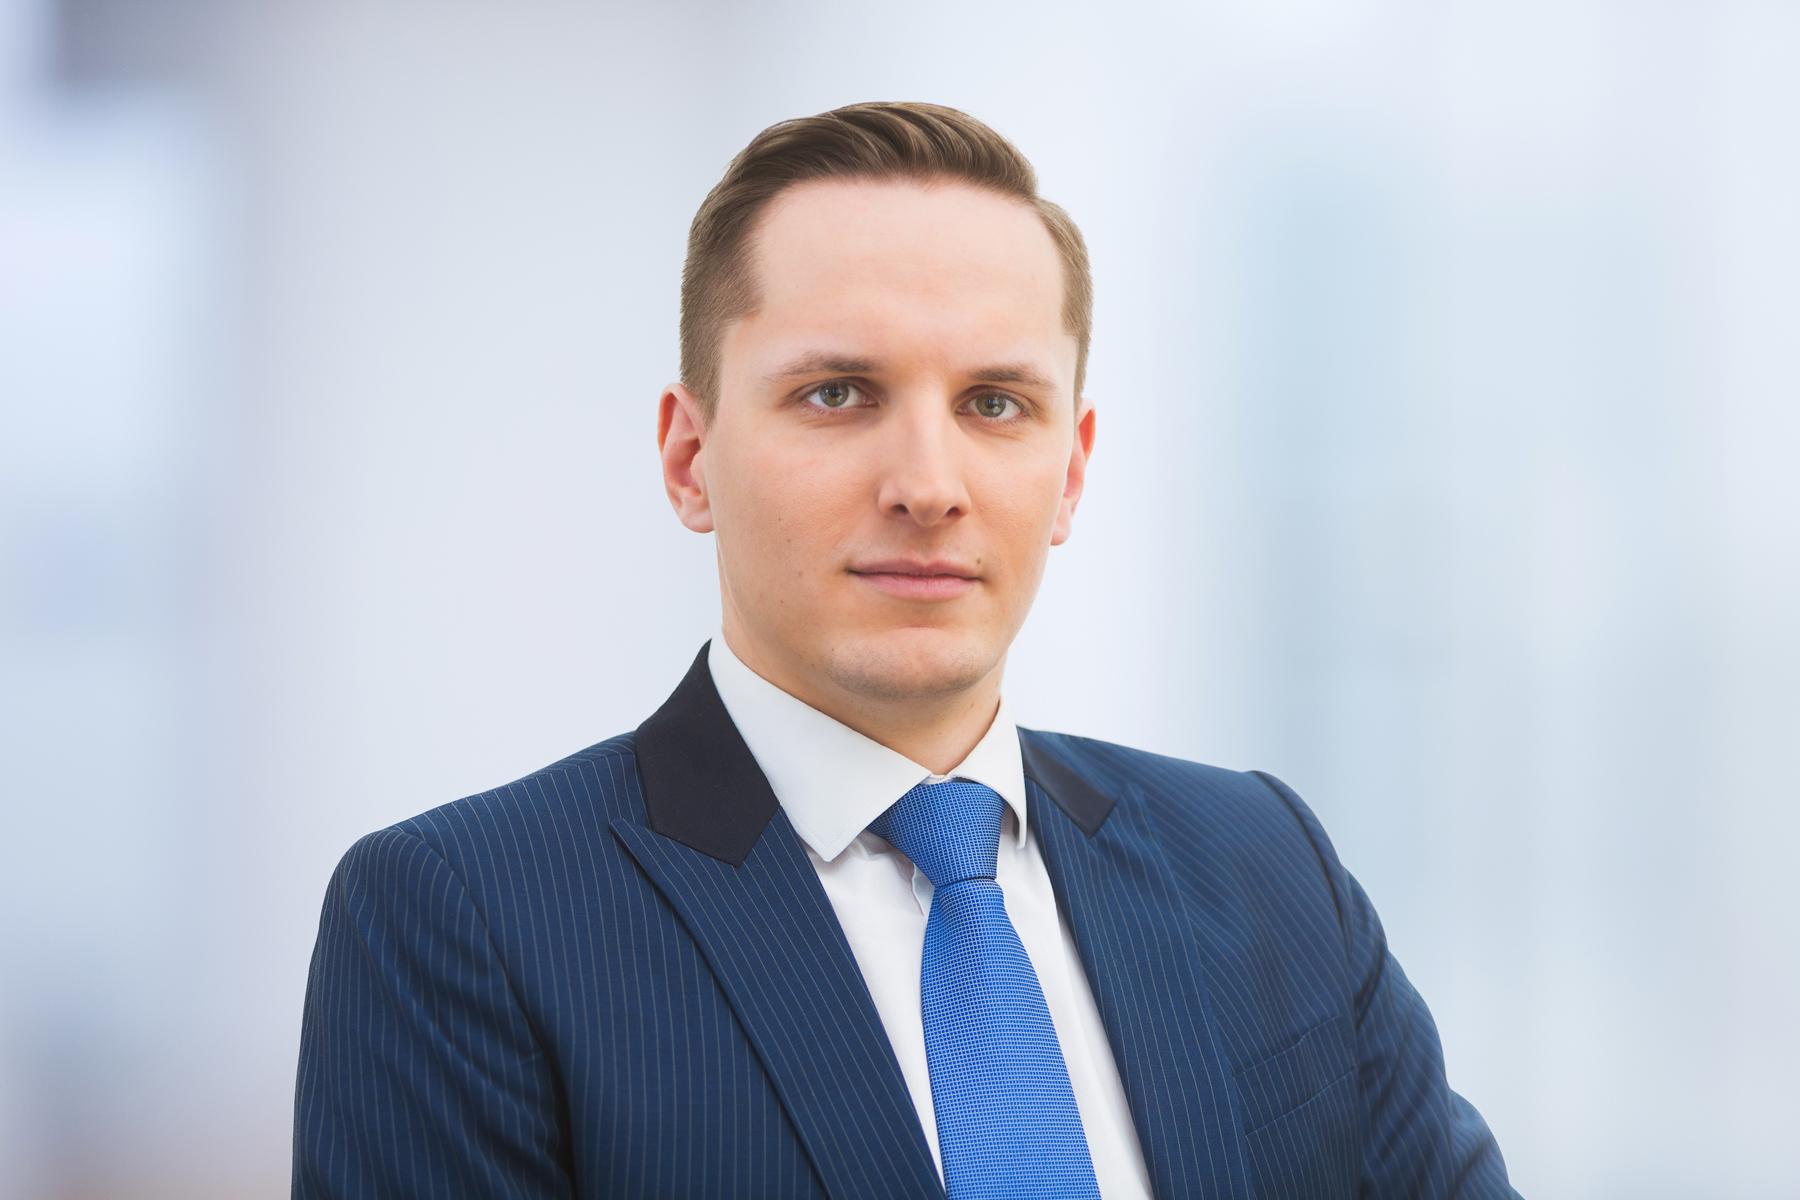 Redgate Capitali müügijuht Kristjan Petjärv. Foto: Arno Mikkor / Redgate Capital